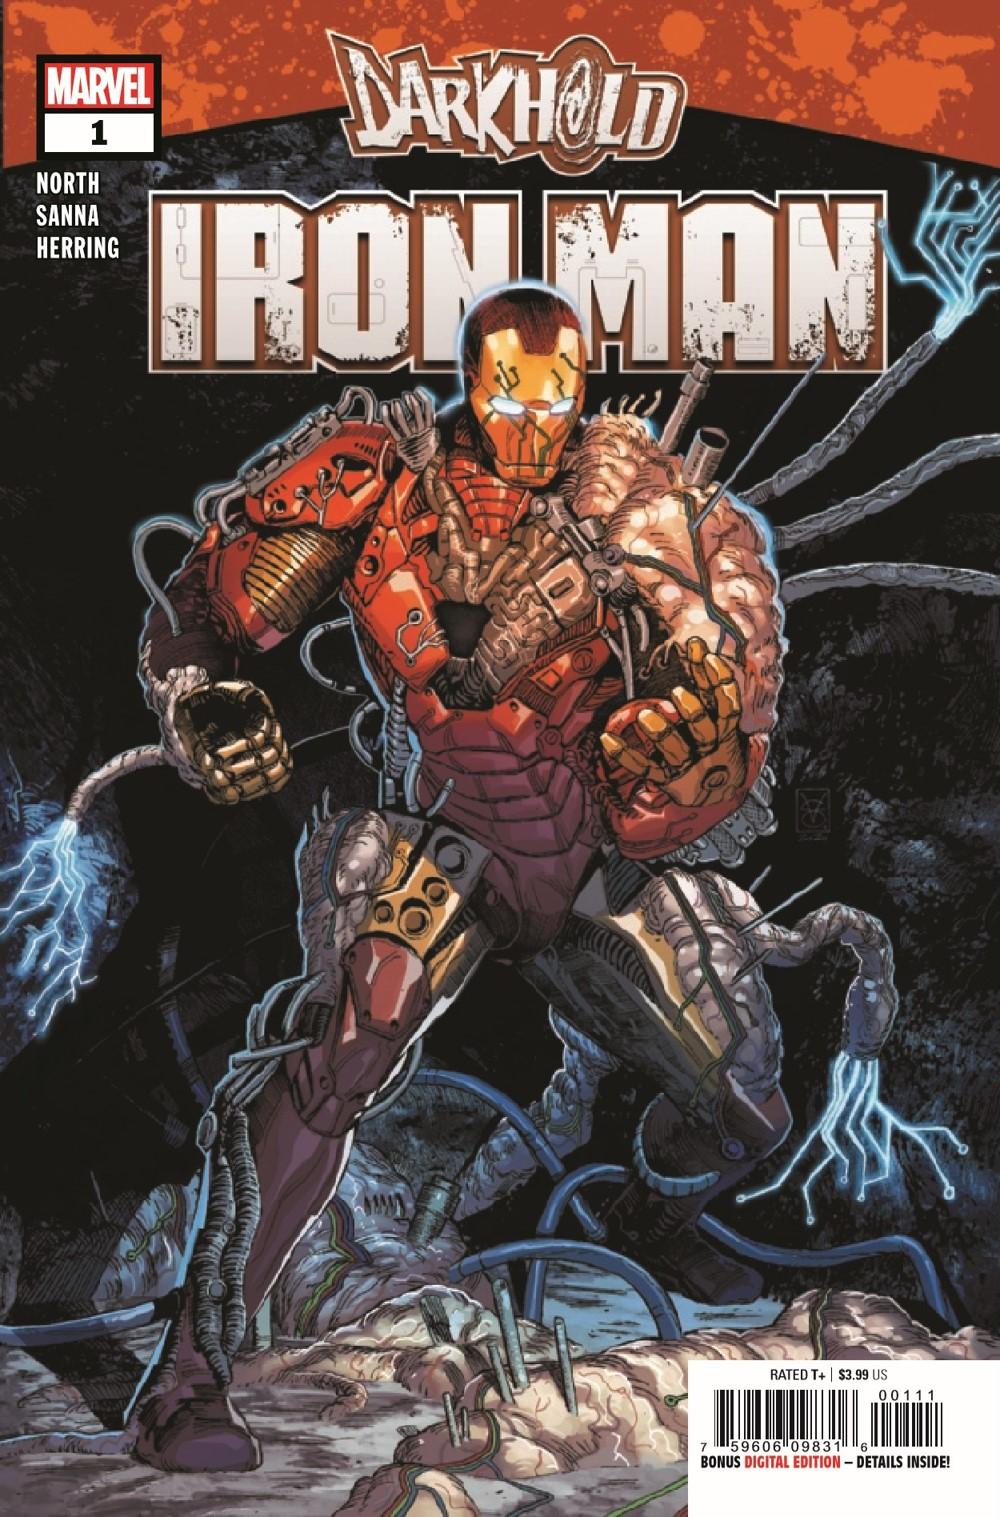 DARKHOLDIM2021001_Preview-1 ComicList Previews: DARKHOLD IRON MAN #1